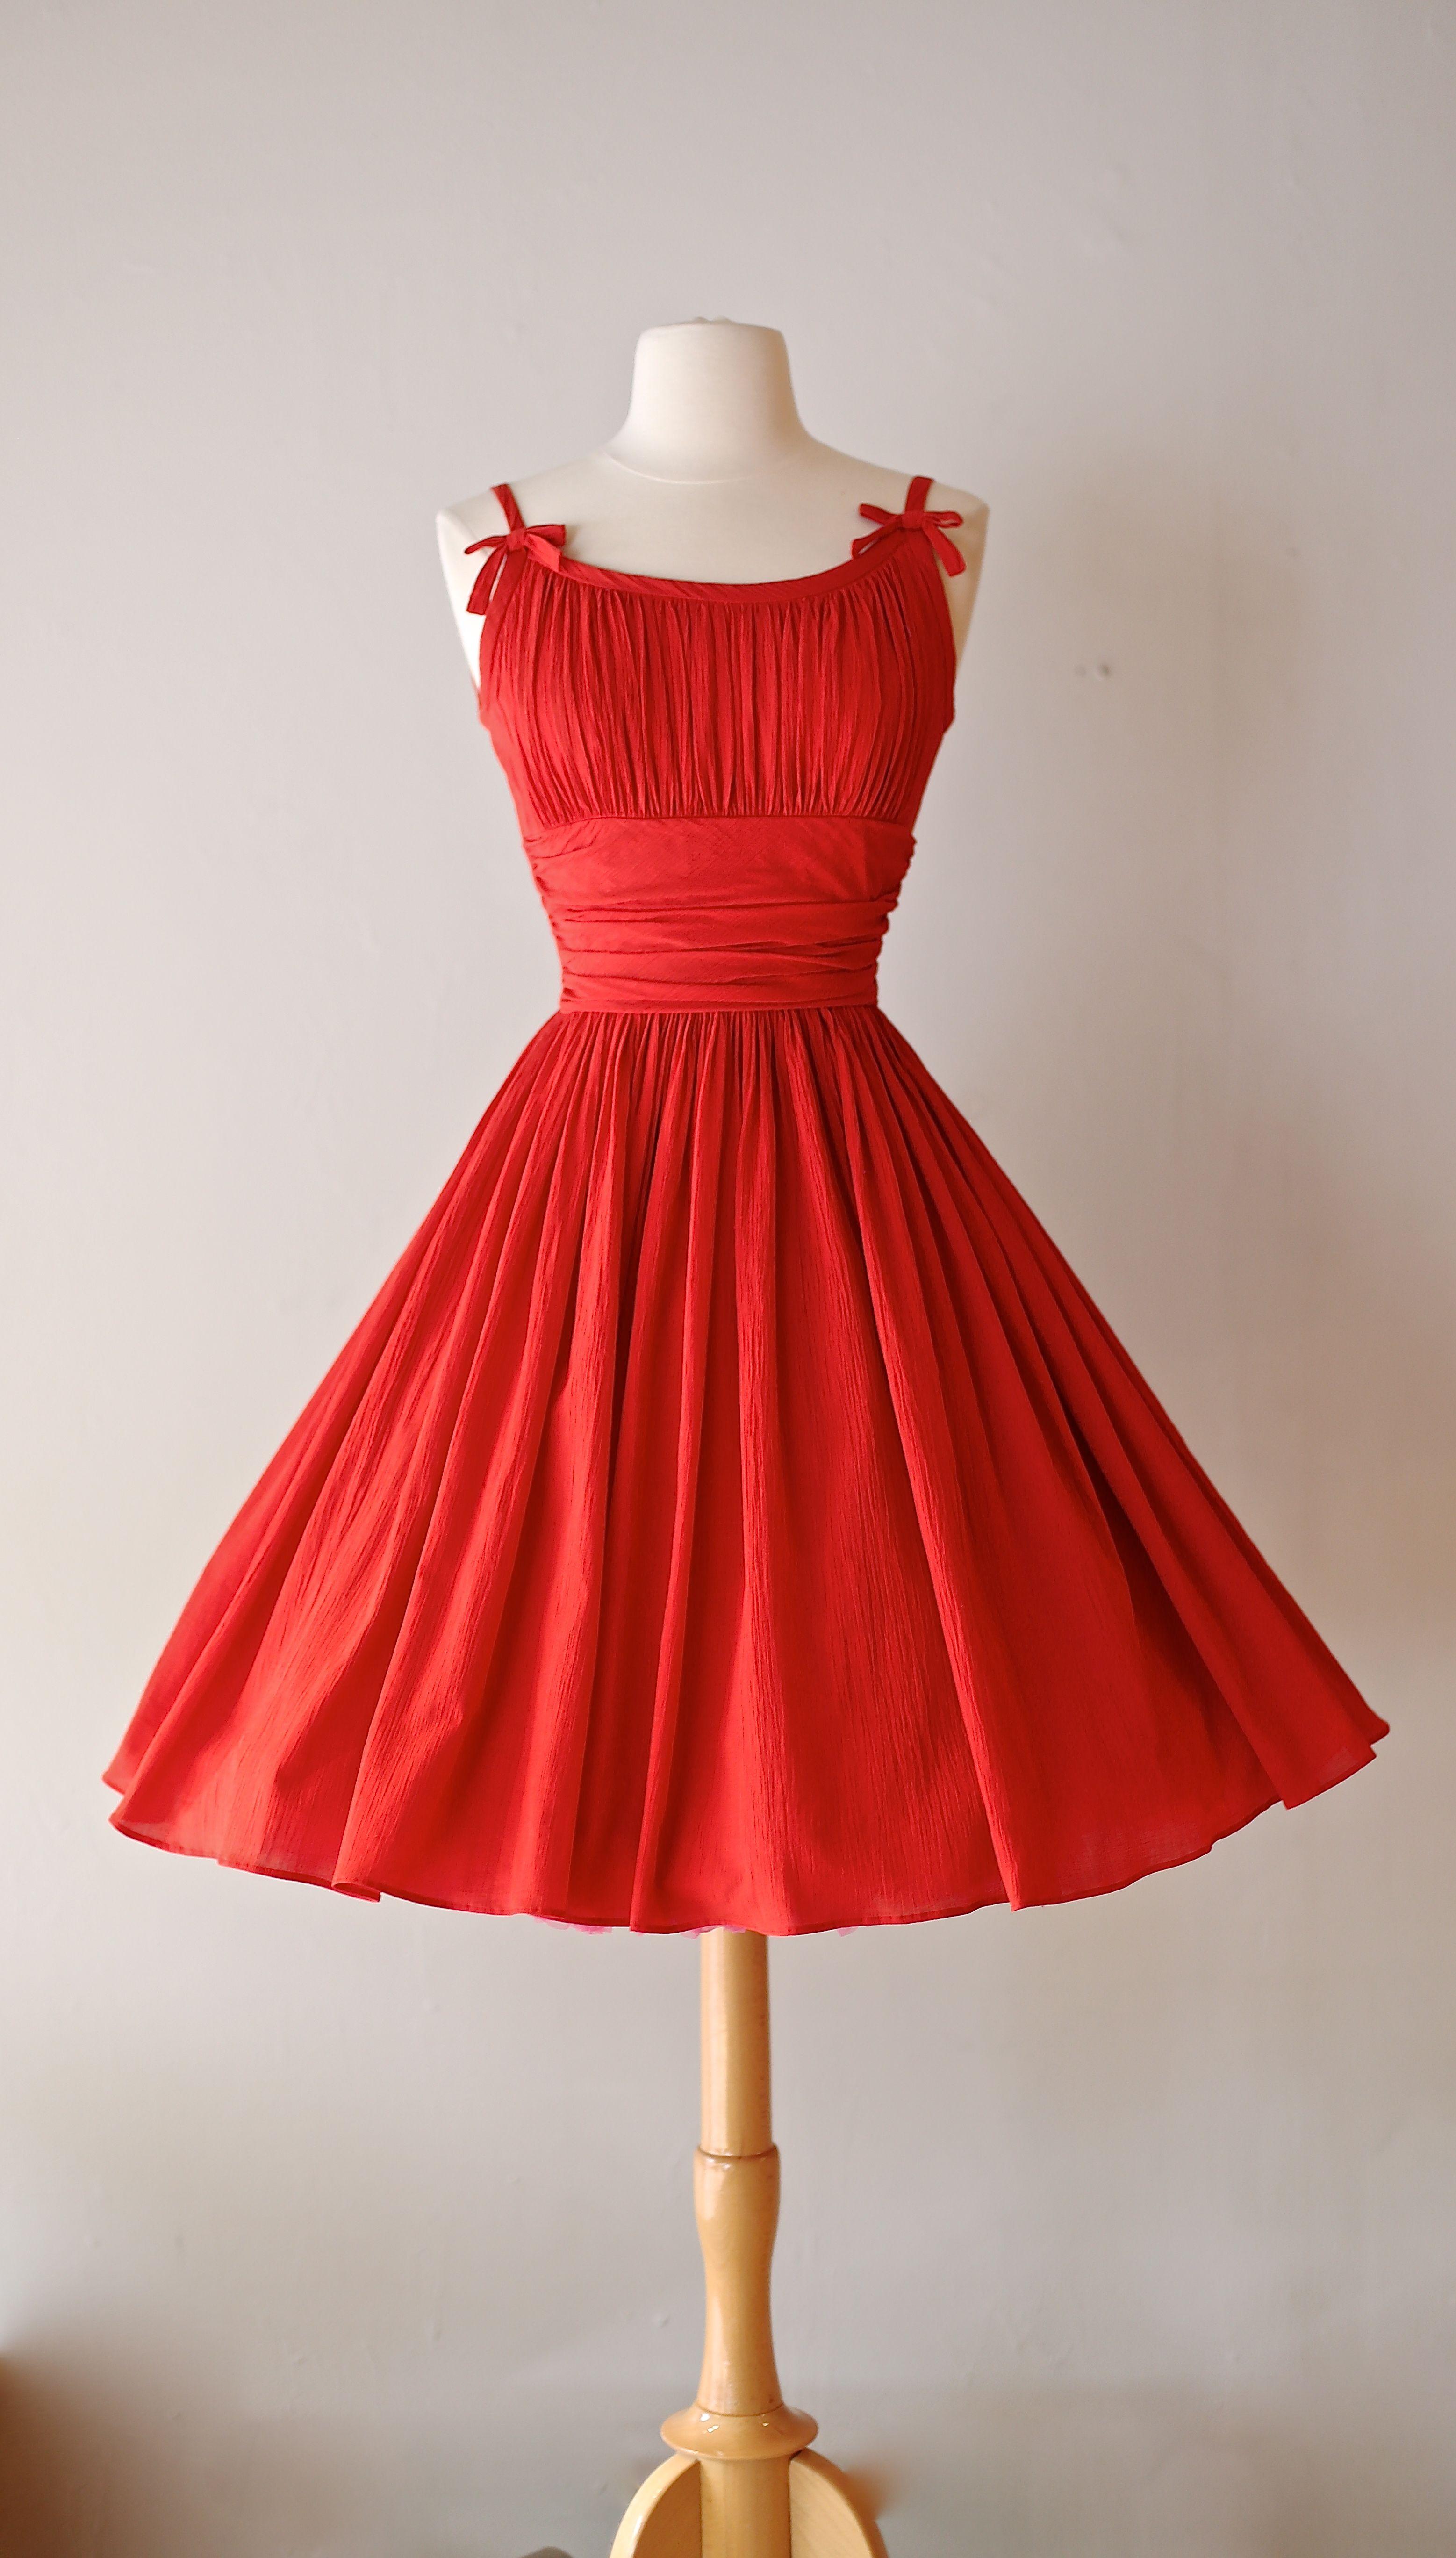 1950 S Dress By Jonathan Logan Available At Xtabay Vintage Dresses Vintage 1950s Dresses Beautiful Dresses [ 5472 x 3115 Pixel ]